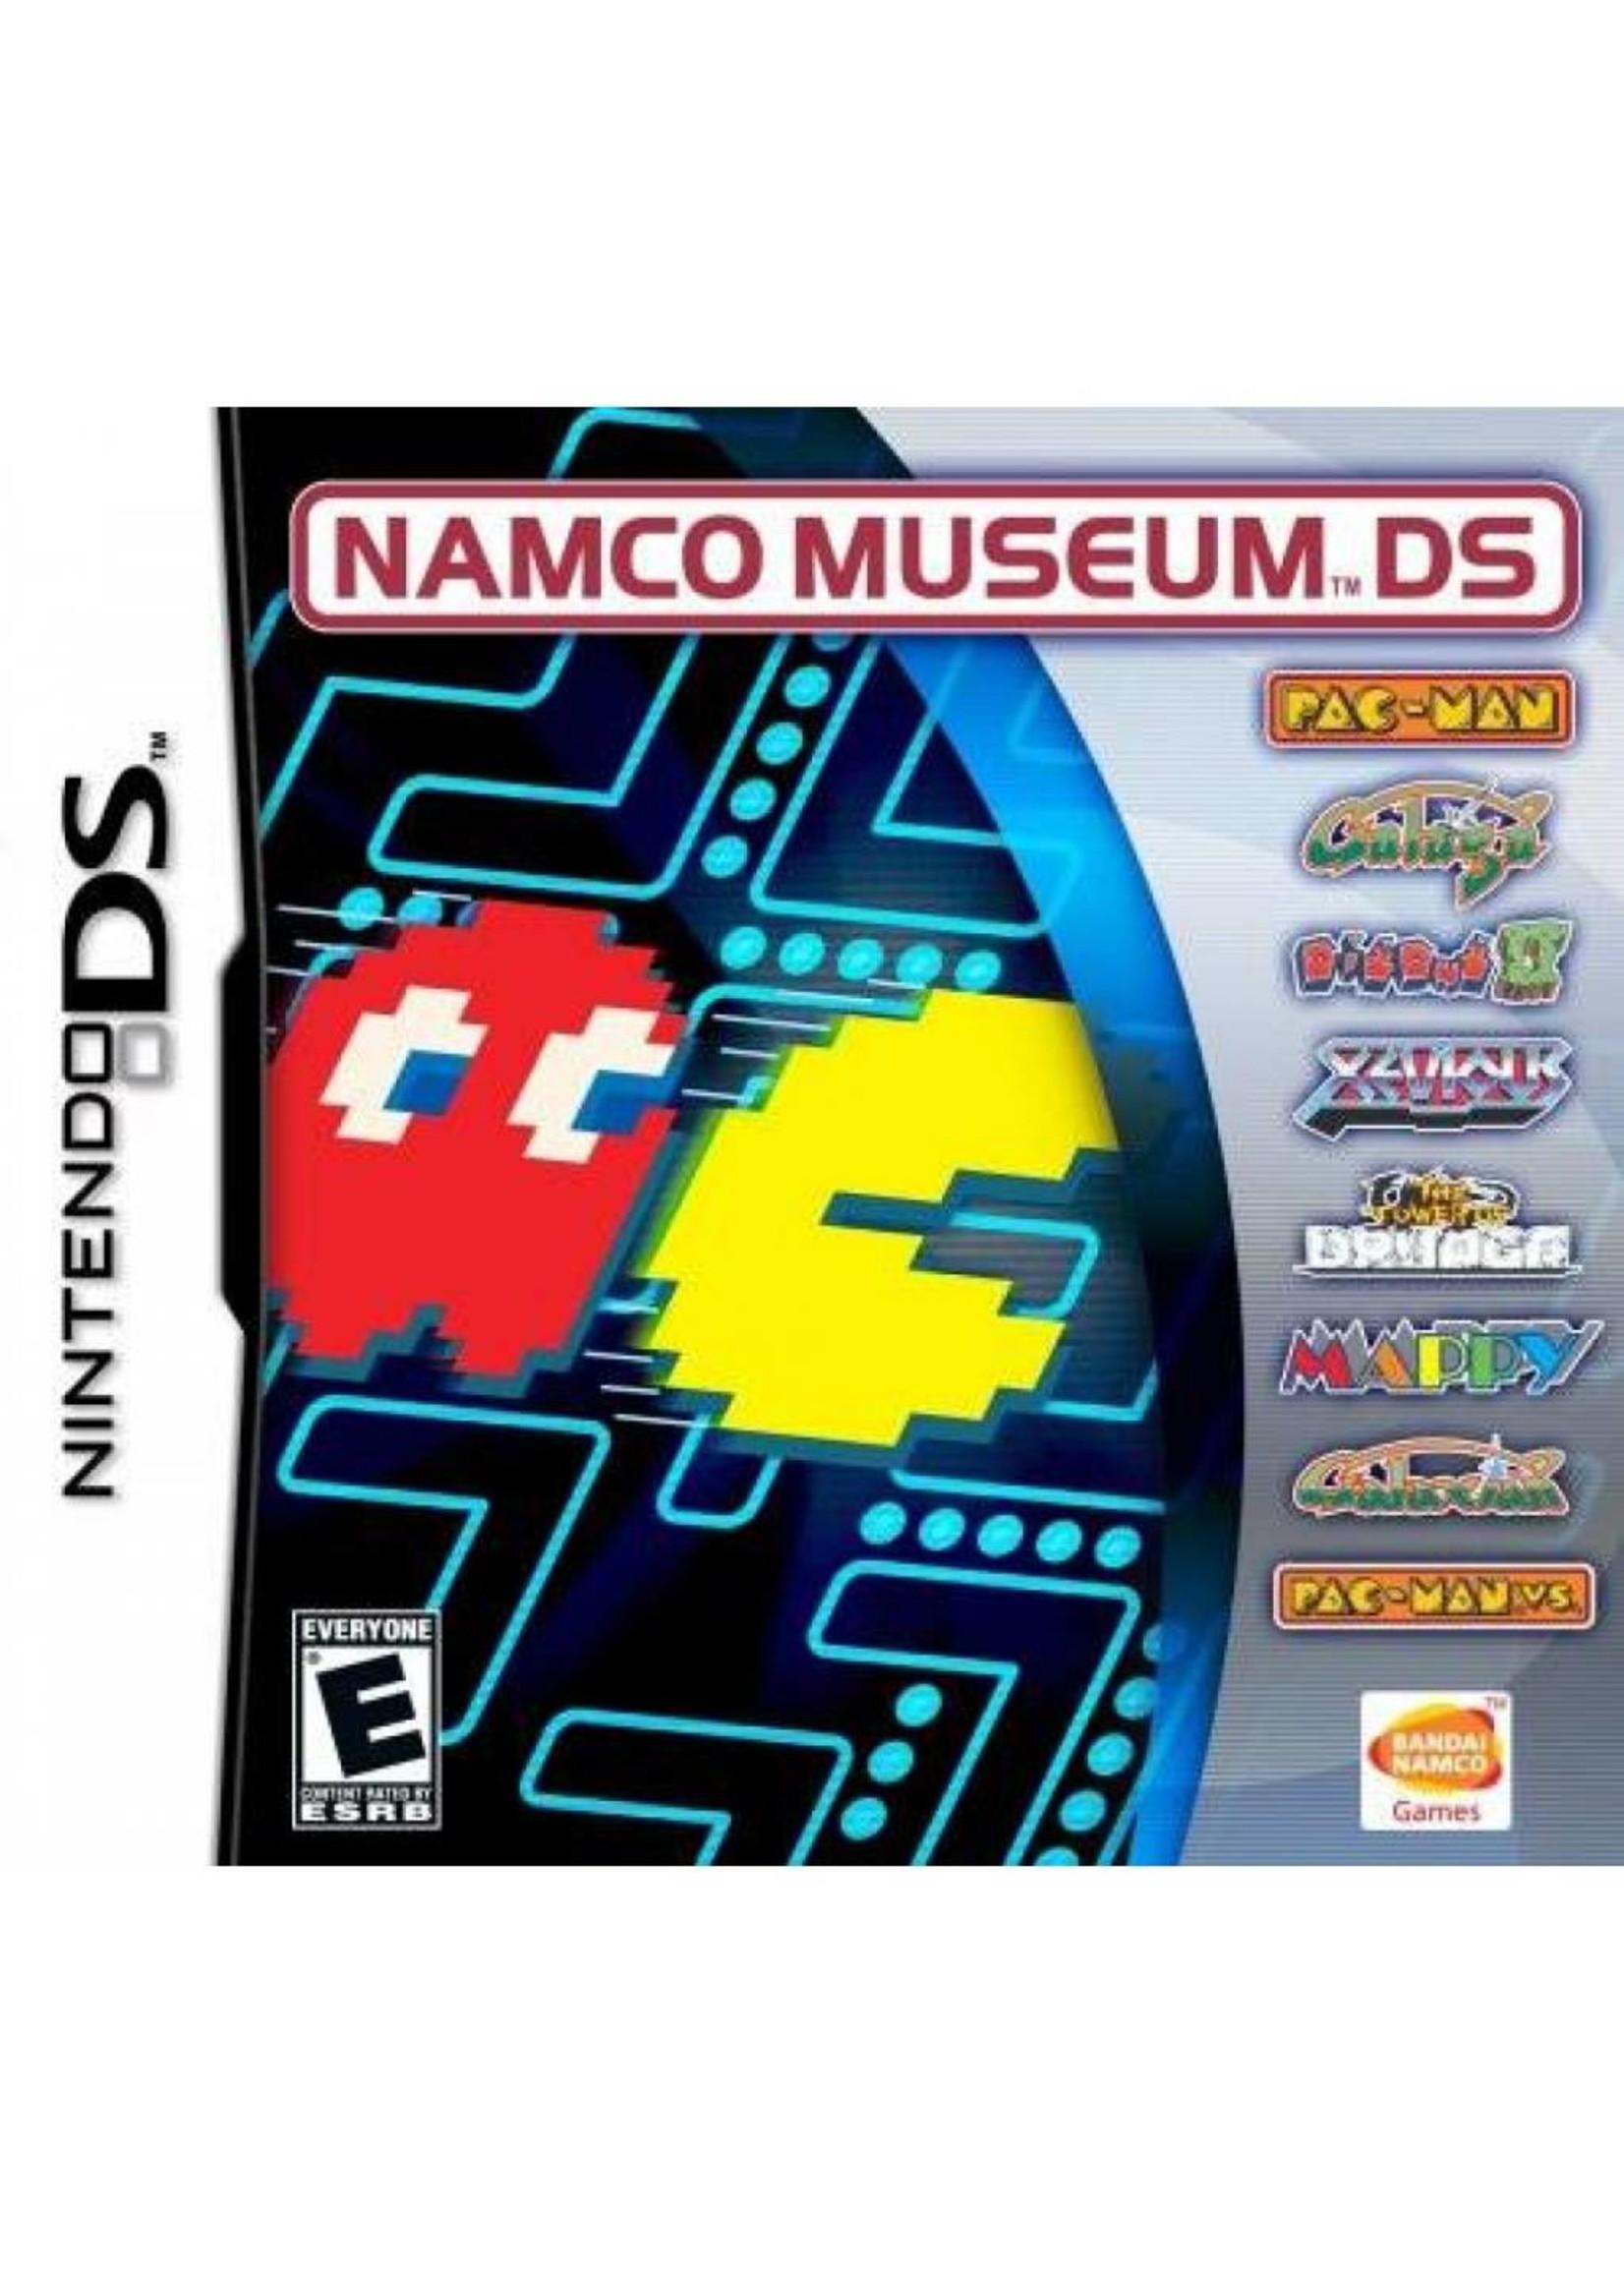 Namco Museum - NDS PrePlayed